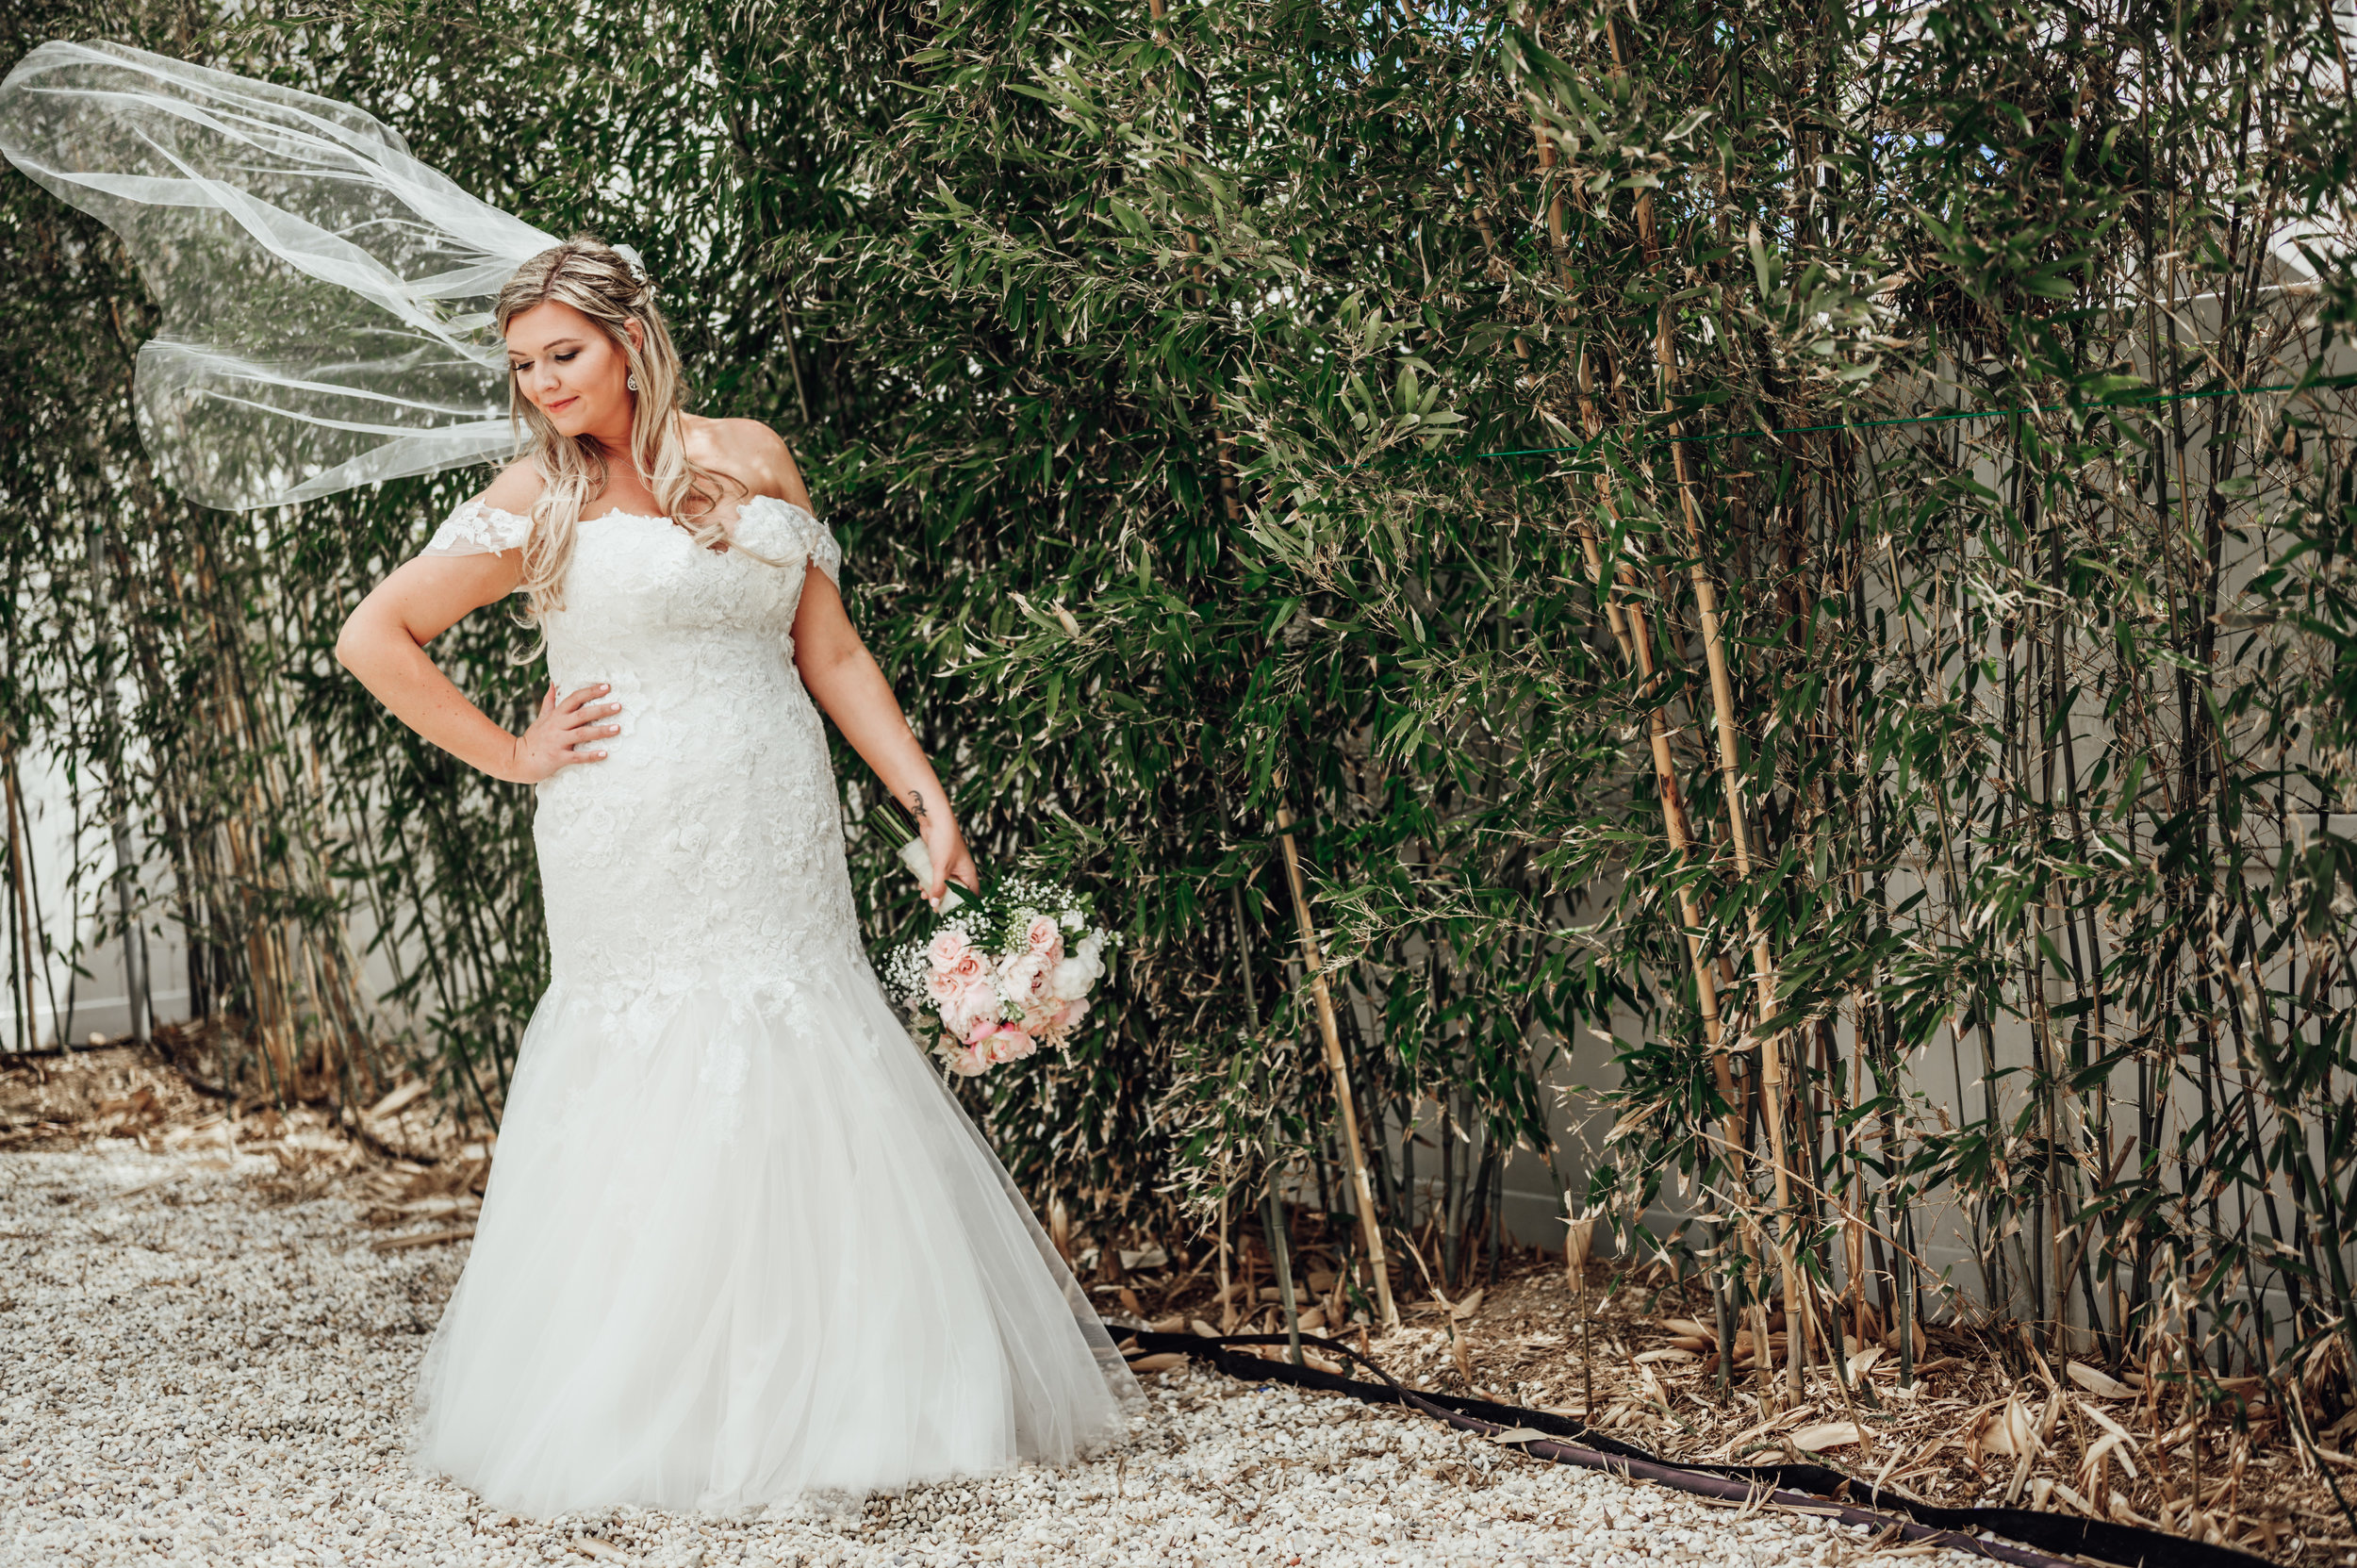 New Jersey Wedding Photographer, Felsberg Photography LBI wedding photography 55.jpg